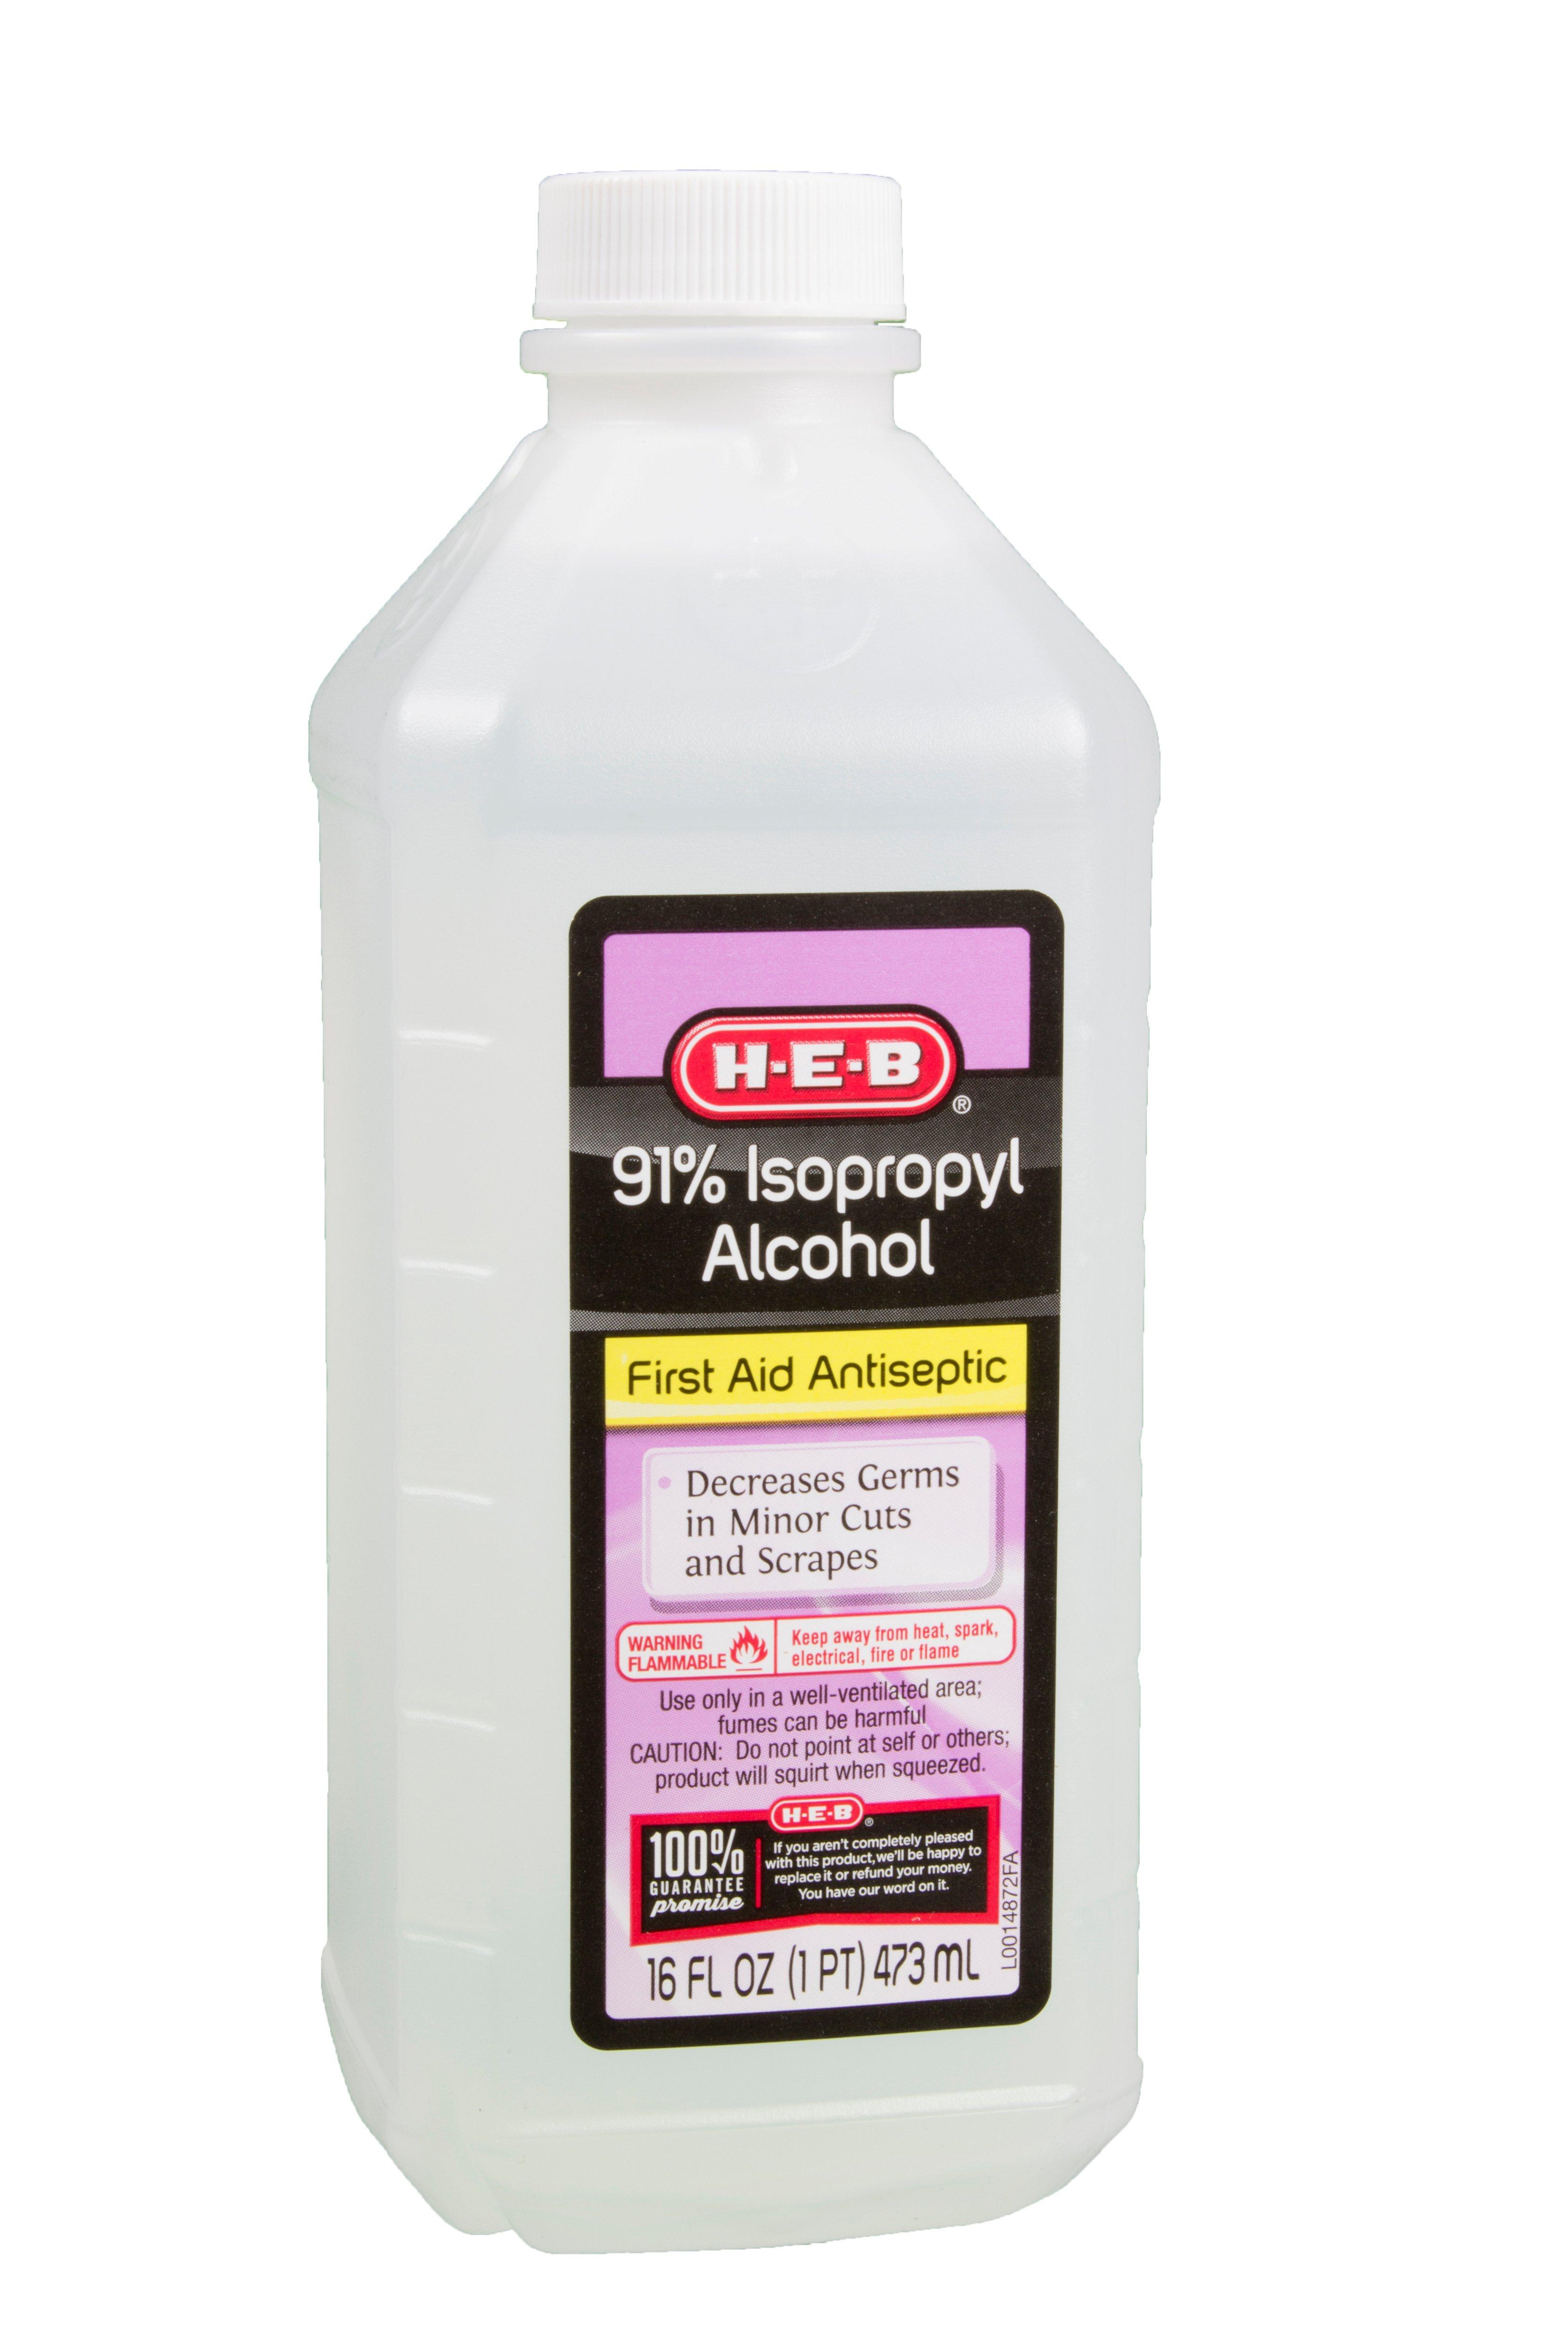 Antiseptics & Antibiotics ‑ Shop H‑E‑B Everyday Low Prices